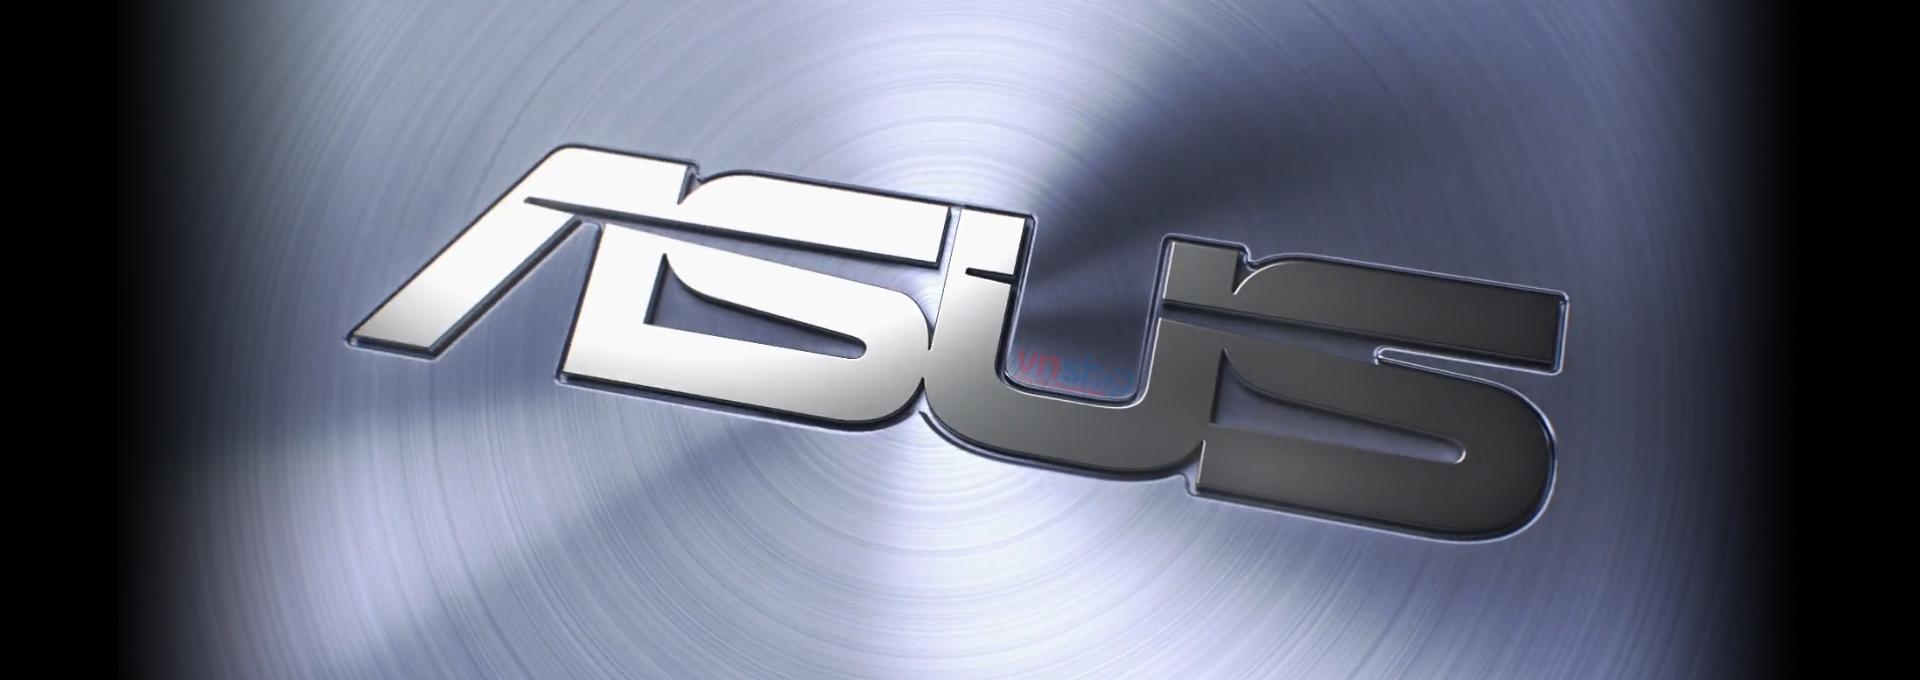 ZenBeam S2 ASUS-logo trên máy chiếu